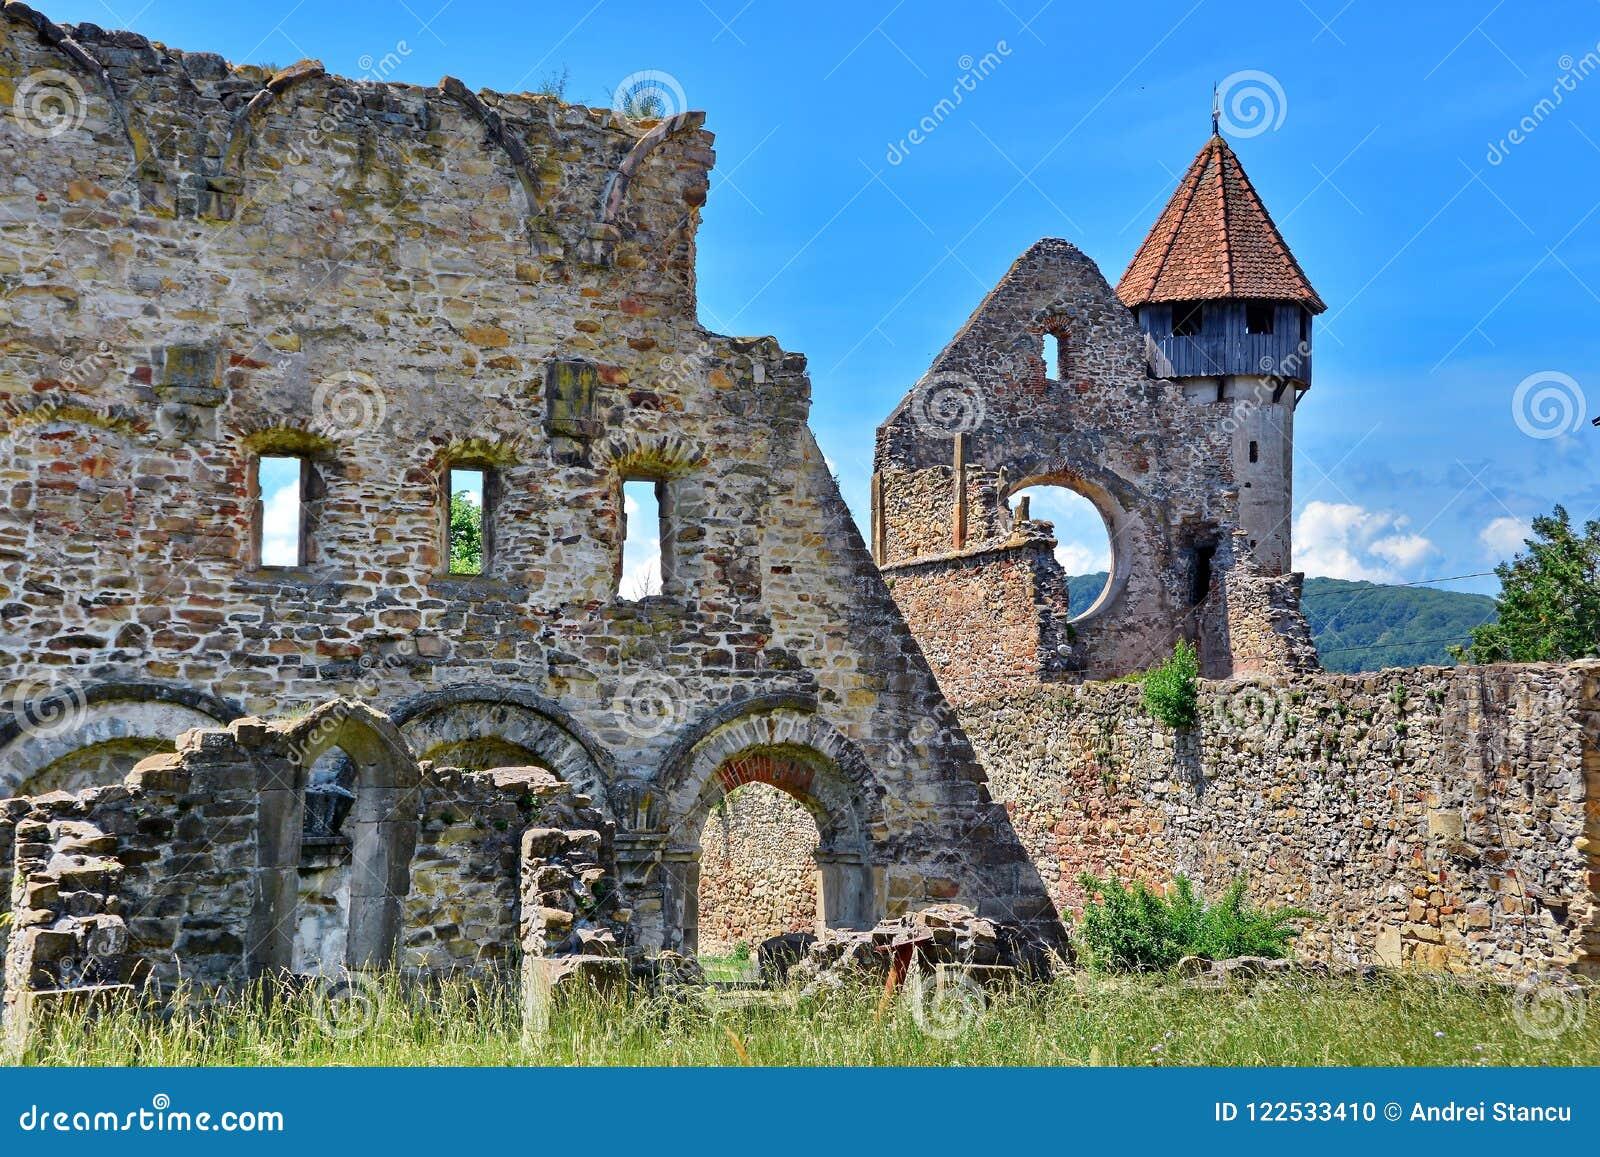 Old Monastery Romania